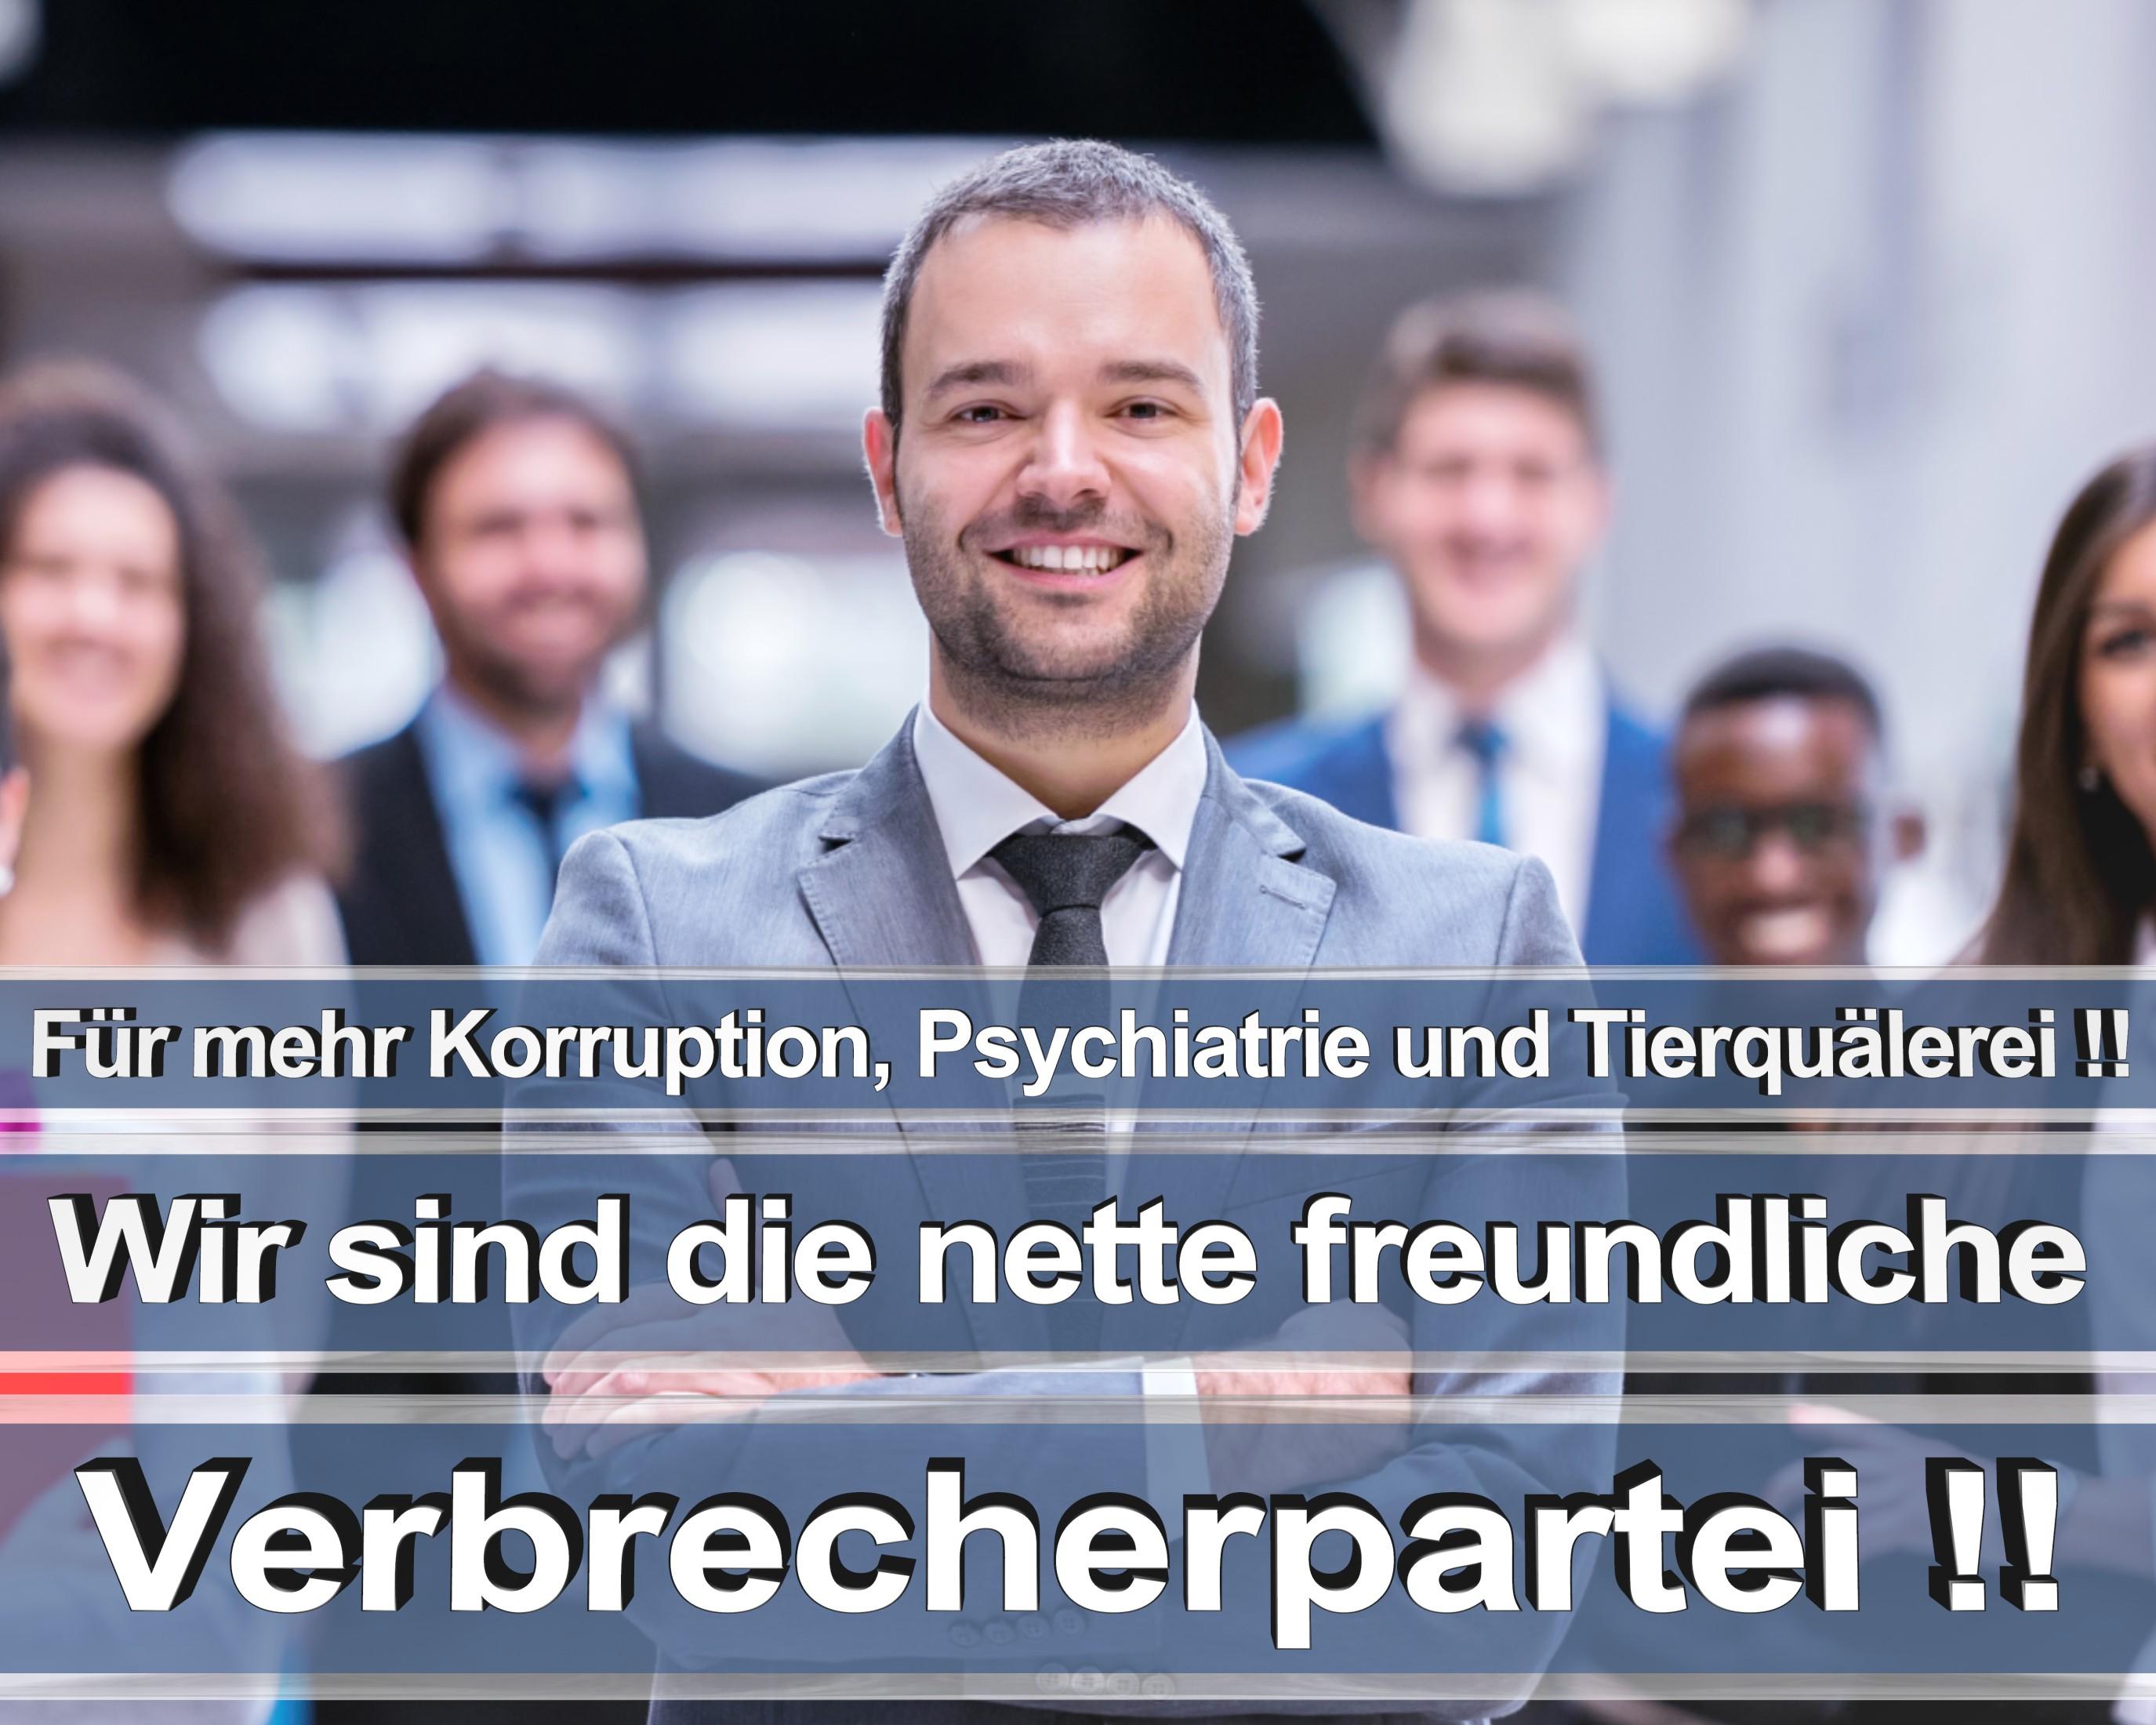 FDP Bielefeld Jan Maik Schlifter, Jasmin Wahl Schwentker, Jens Andernacht, Laura Schubert, Dr Klaus Schleicher, Rainer Seifert (4)